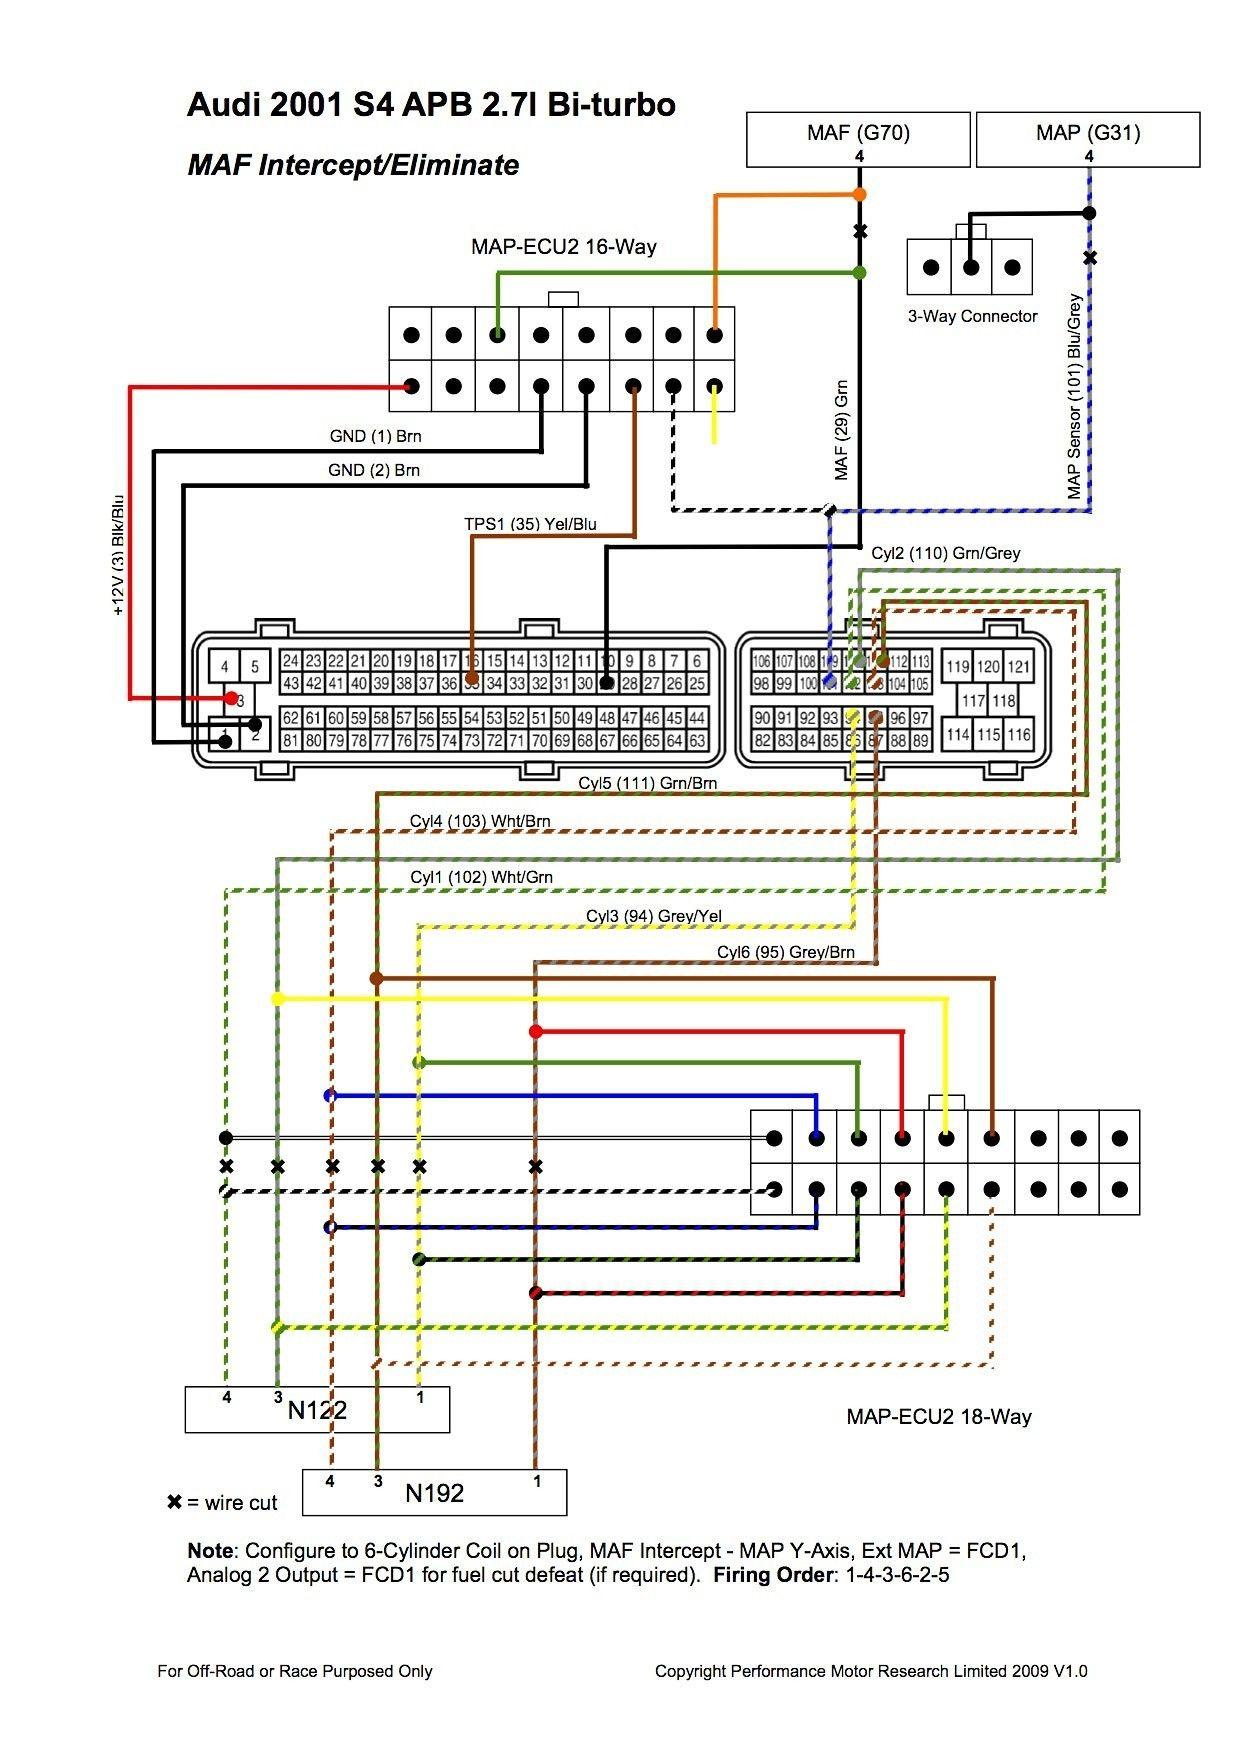 Jvc Kd-r330 Wiring Diagram : kd-r330, wiring, diagram, Wiring, Harness, Diagram, Chopper, Basic, Contuor.karo-wong-liyo.jeanjaures37.fr